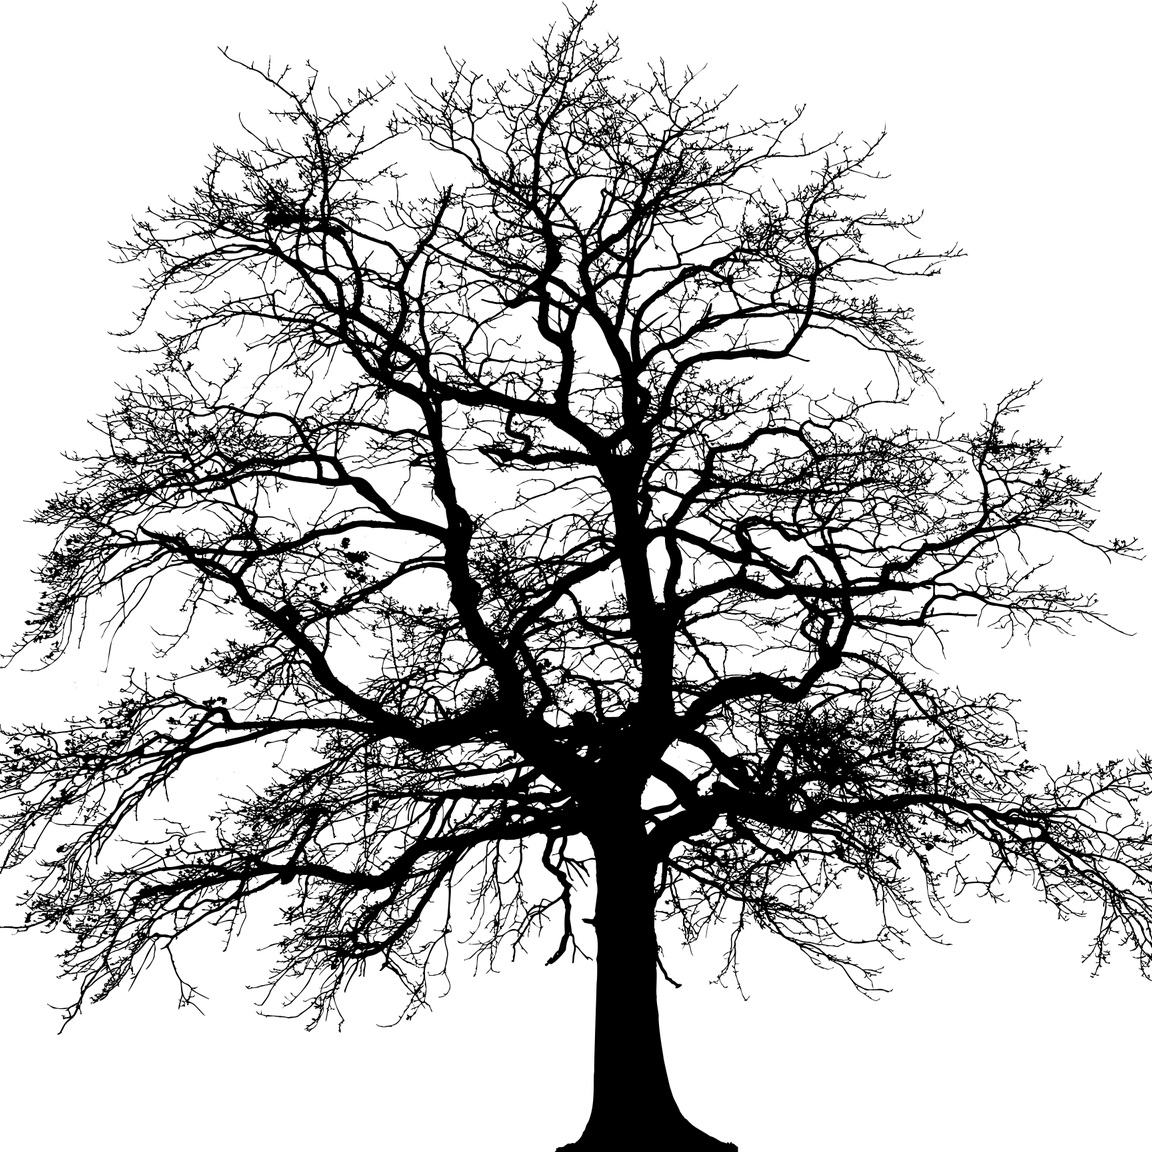 tree-3979965_1280.jpg